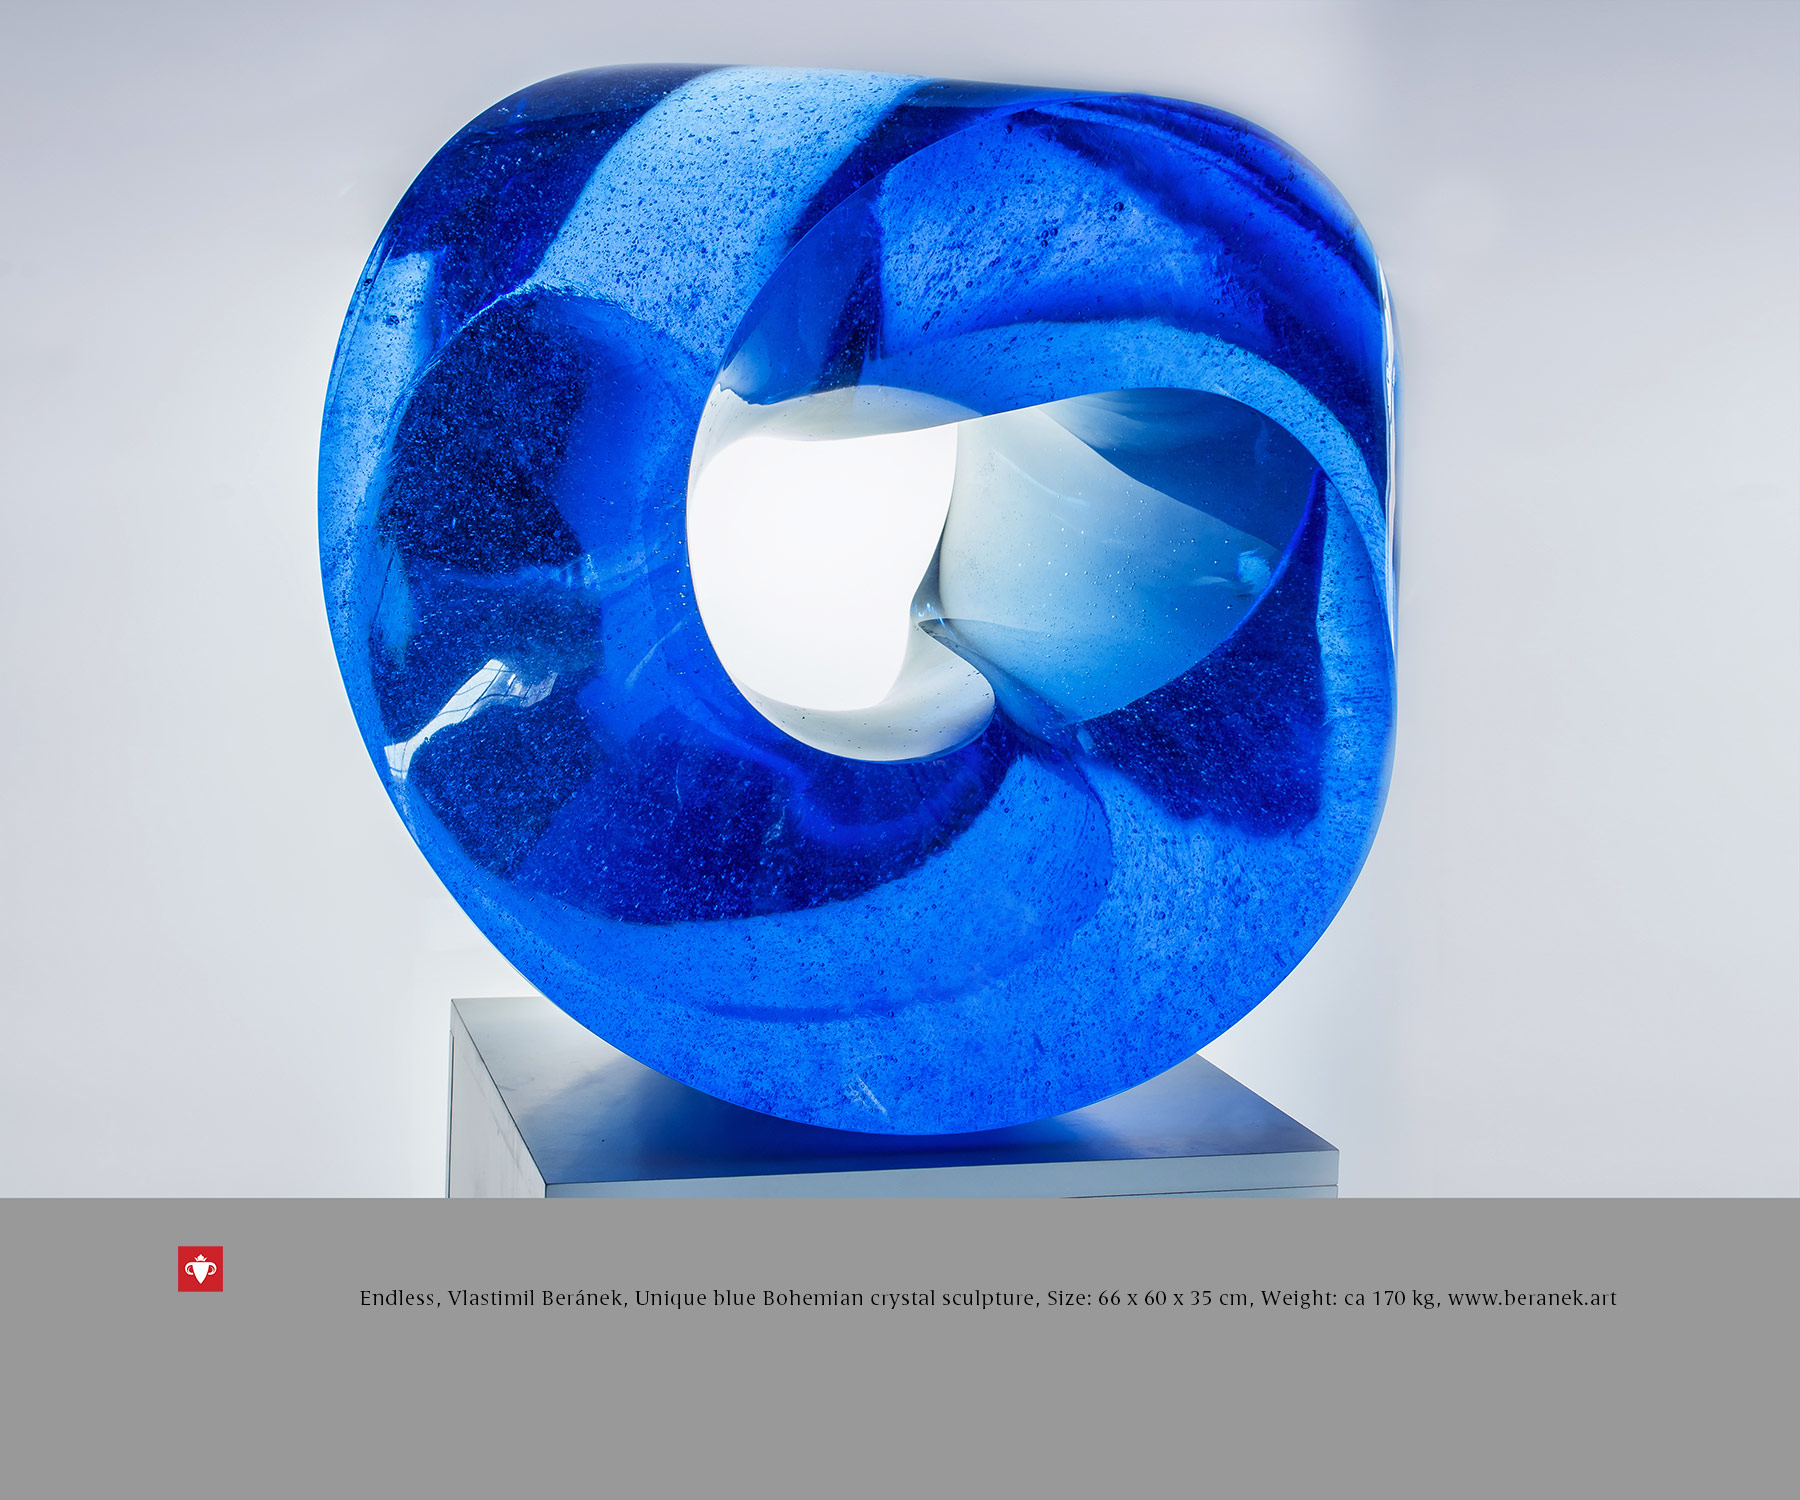 The Best of Glass Art: Vlastimil Beránek glass sculpture The Best of Glass Sculpture Art: Vlastimil Beránek Endless Vlastimil Beranek